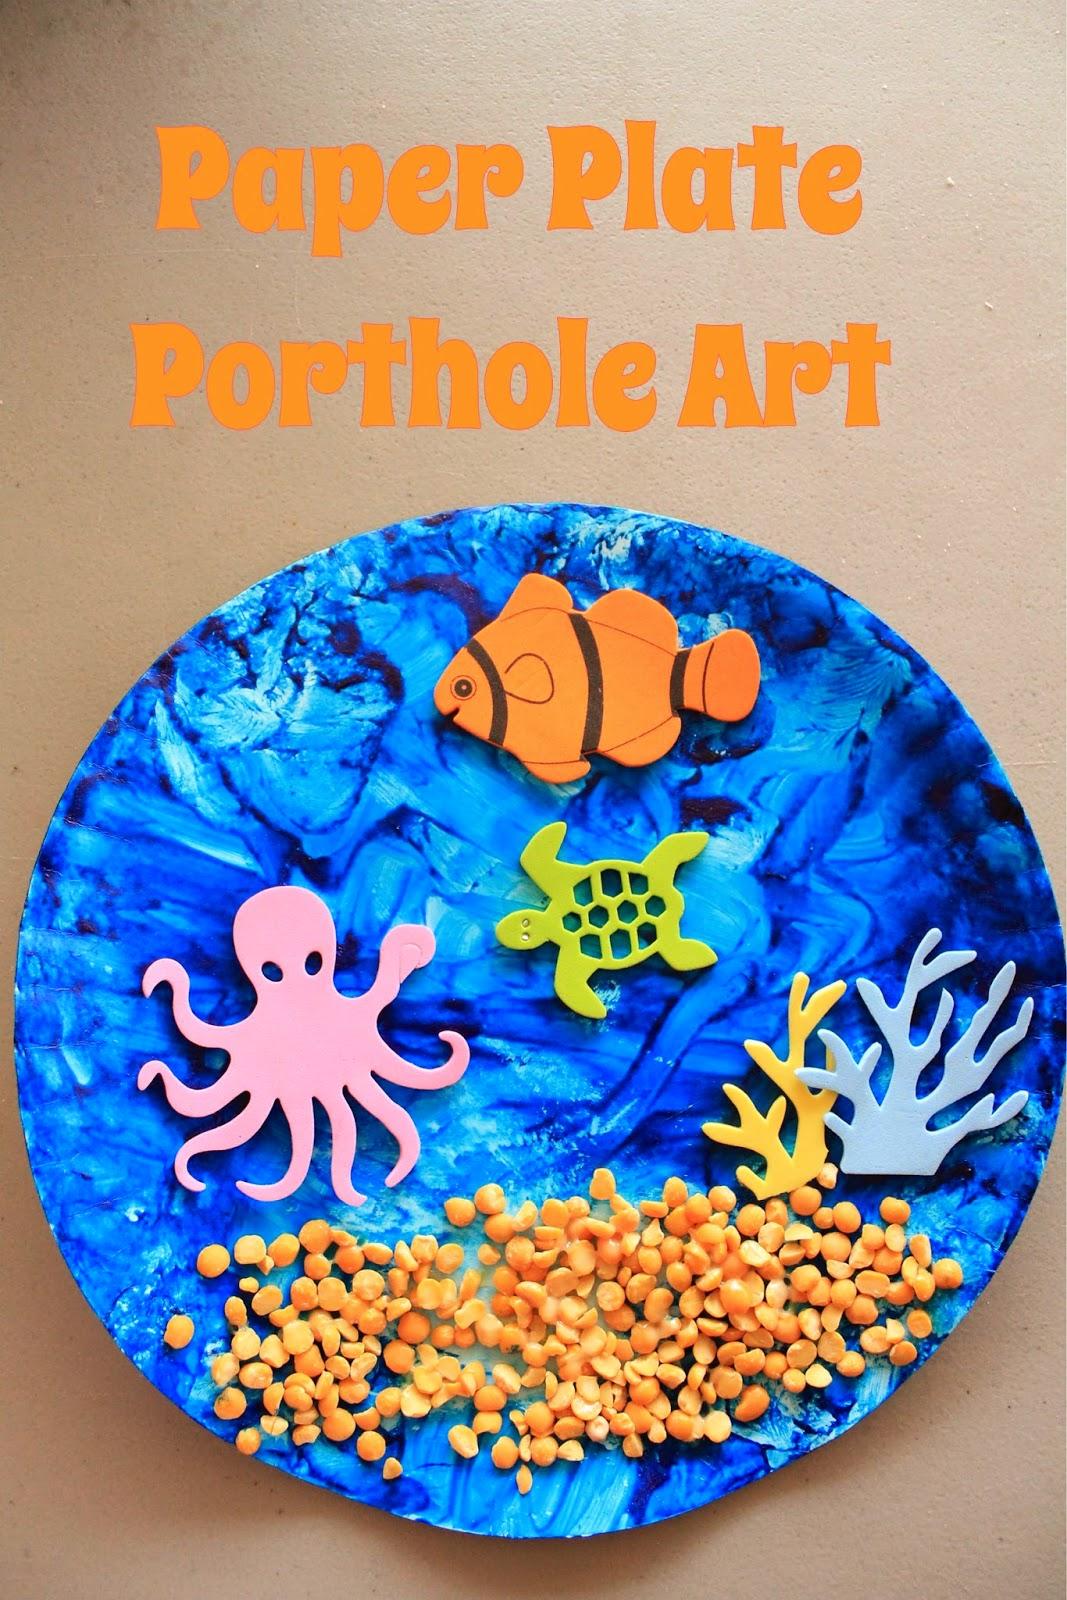 Paper Plate Porthole Art & MakingMamaMagic: Paper Plate Porthole Art